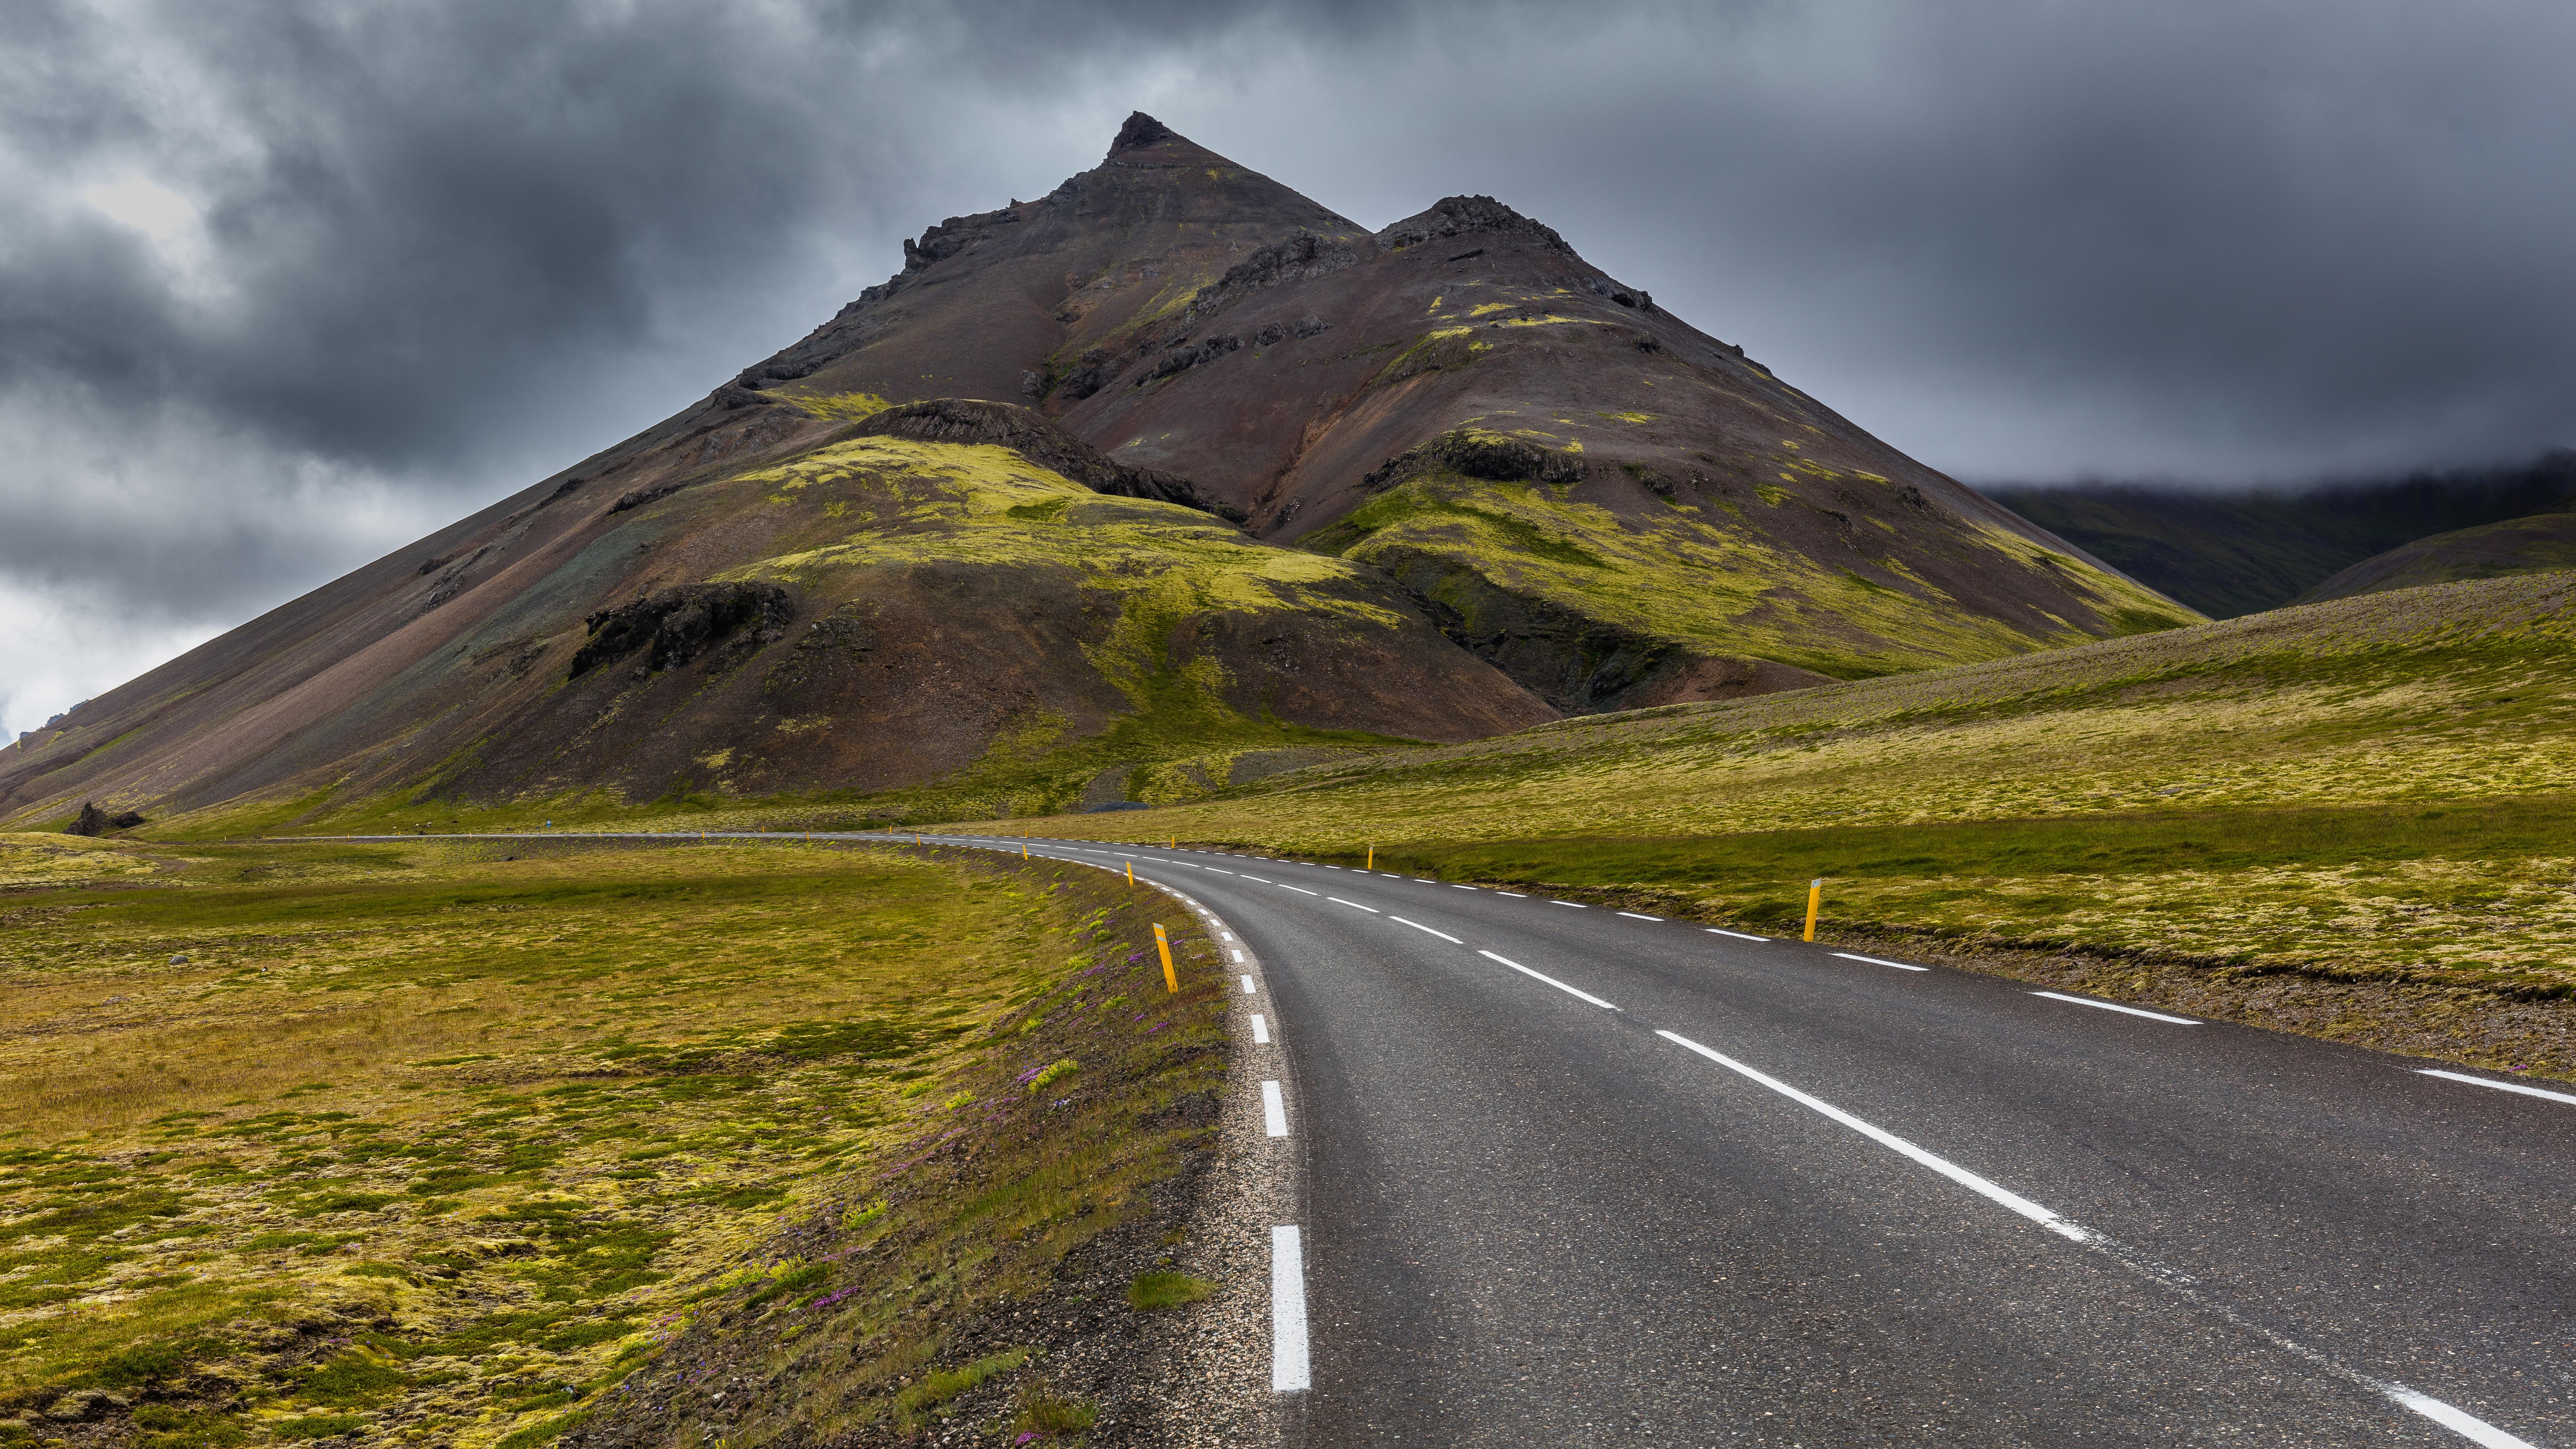 Road in the barren countryside wallpaper